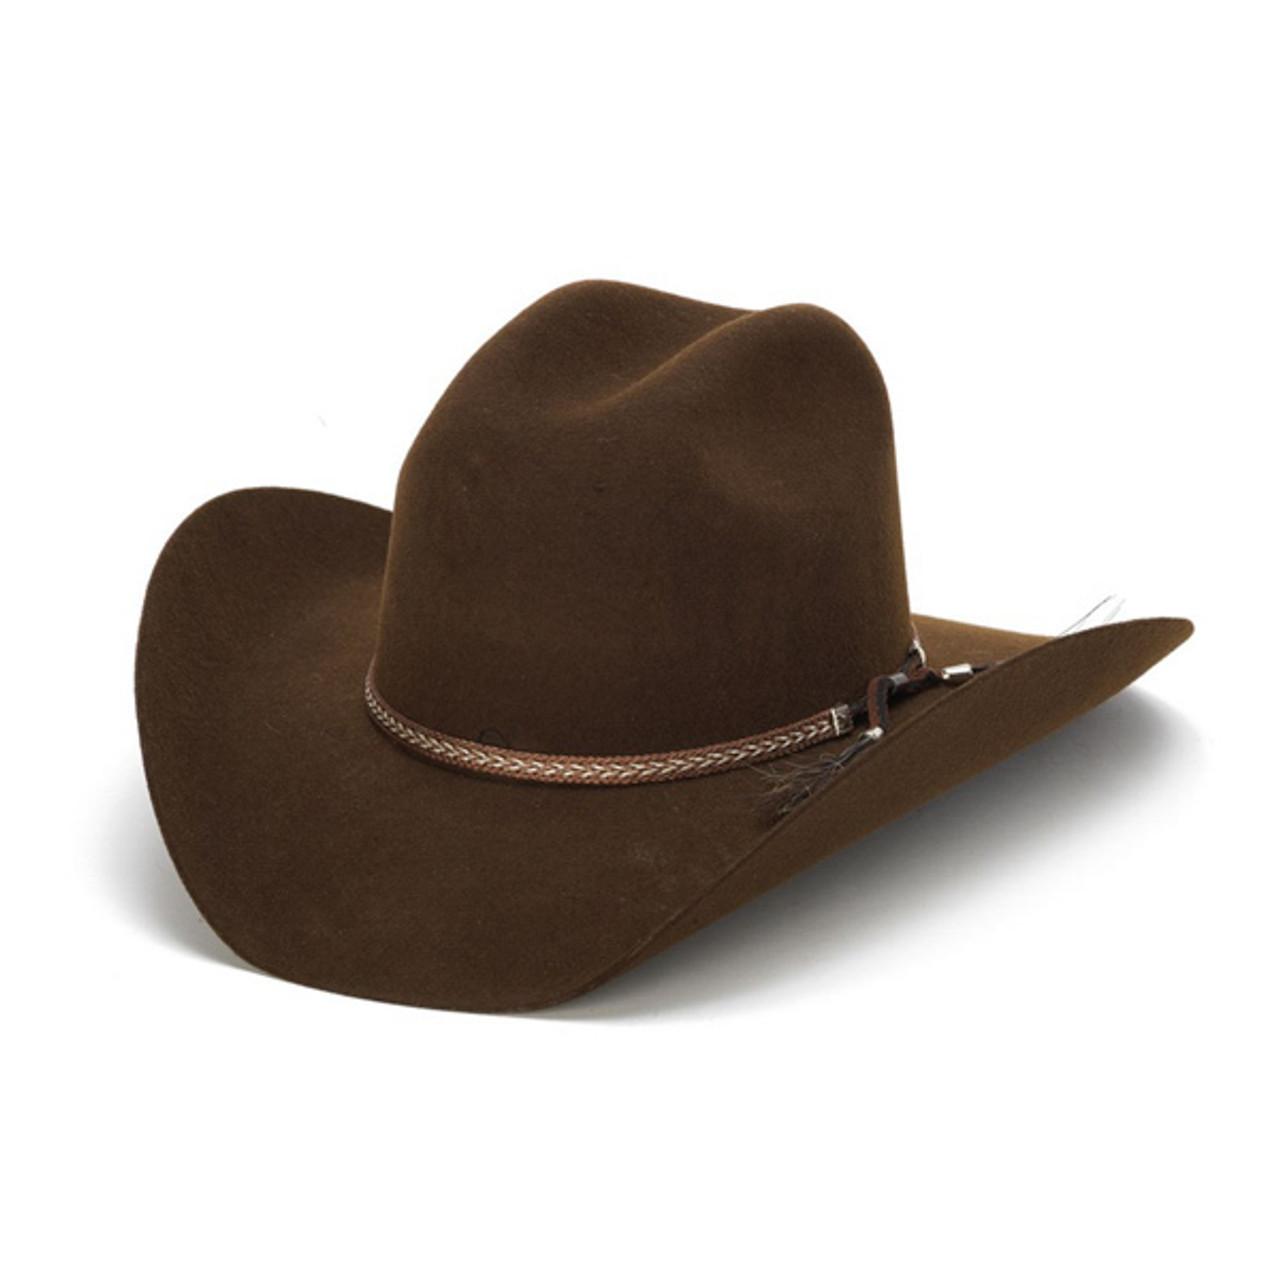 a0f9737c2f0bd Stampede Hats